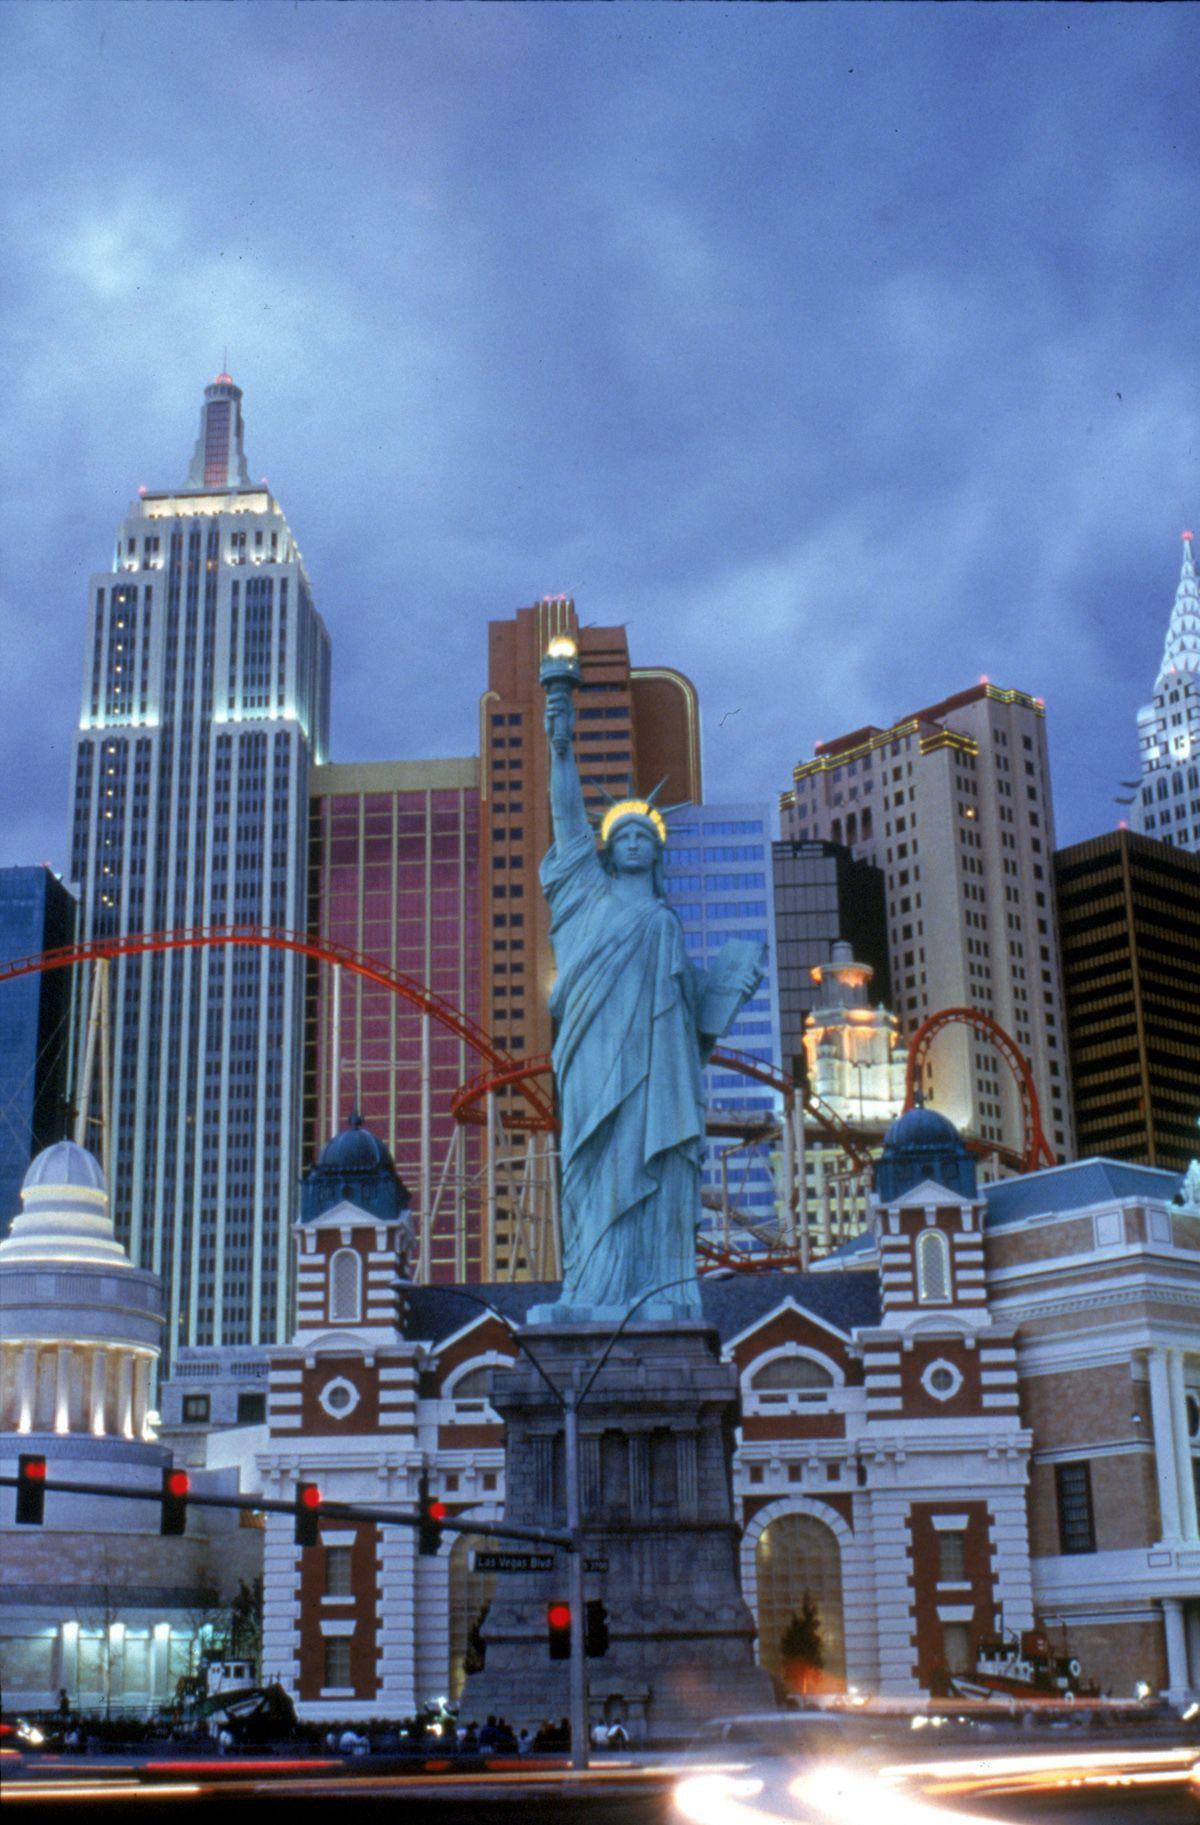 New York New York At Las Vegas Rode The Roller Coaster It S Awesome Las Vegas Trip Las Vegas Hotels Las Vegas Photos